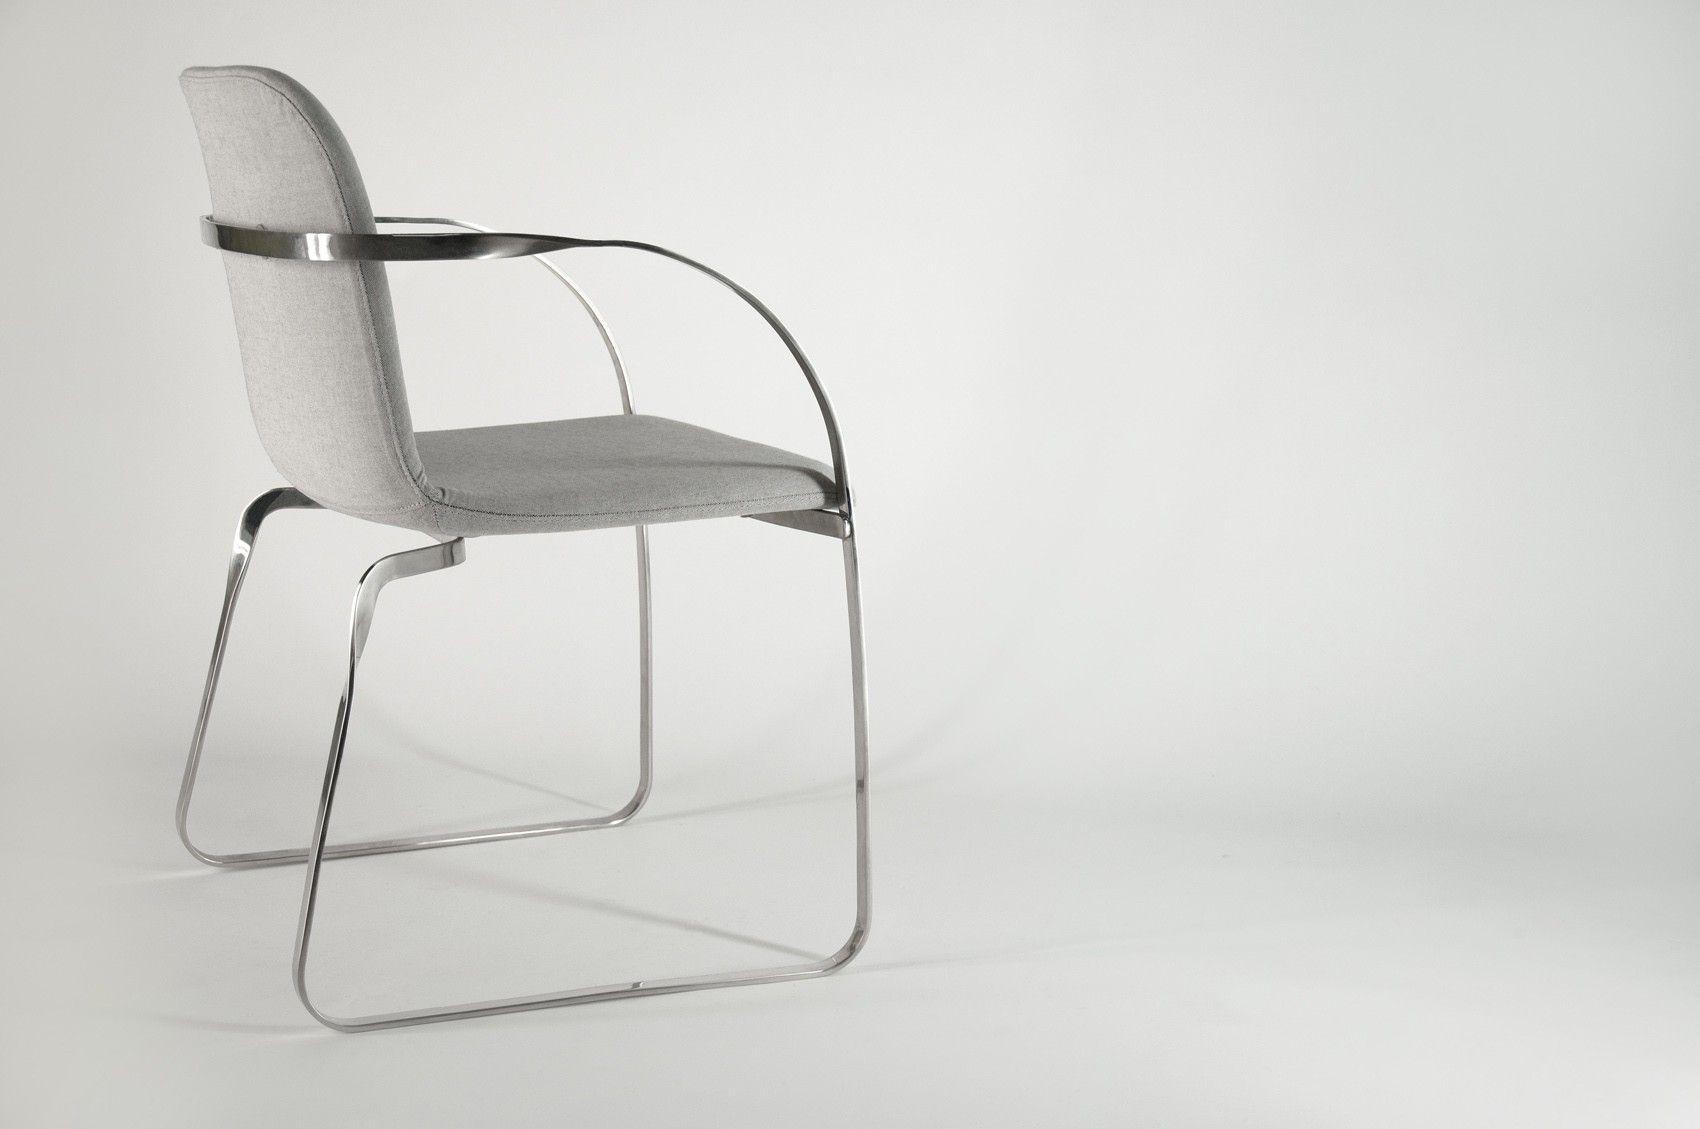 Silla Corso Federico Churba Furniture Pinterest Sillas Y  # Muebles Federico Churba